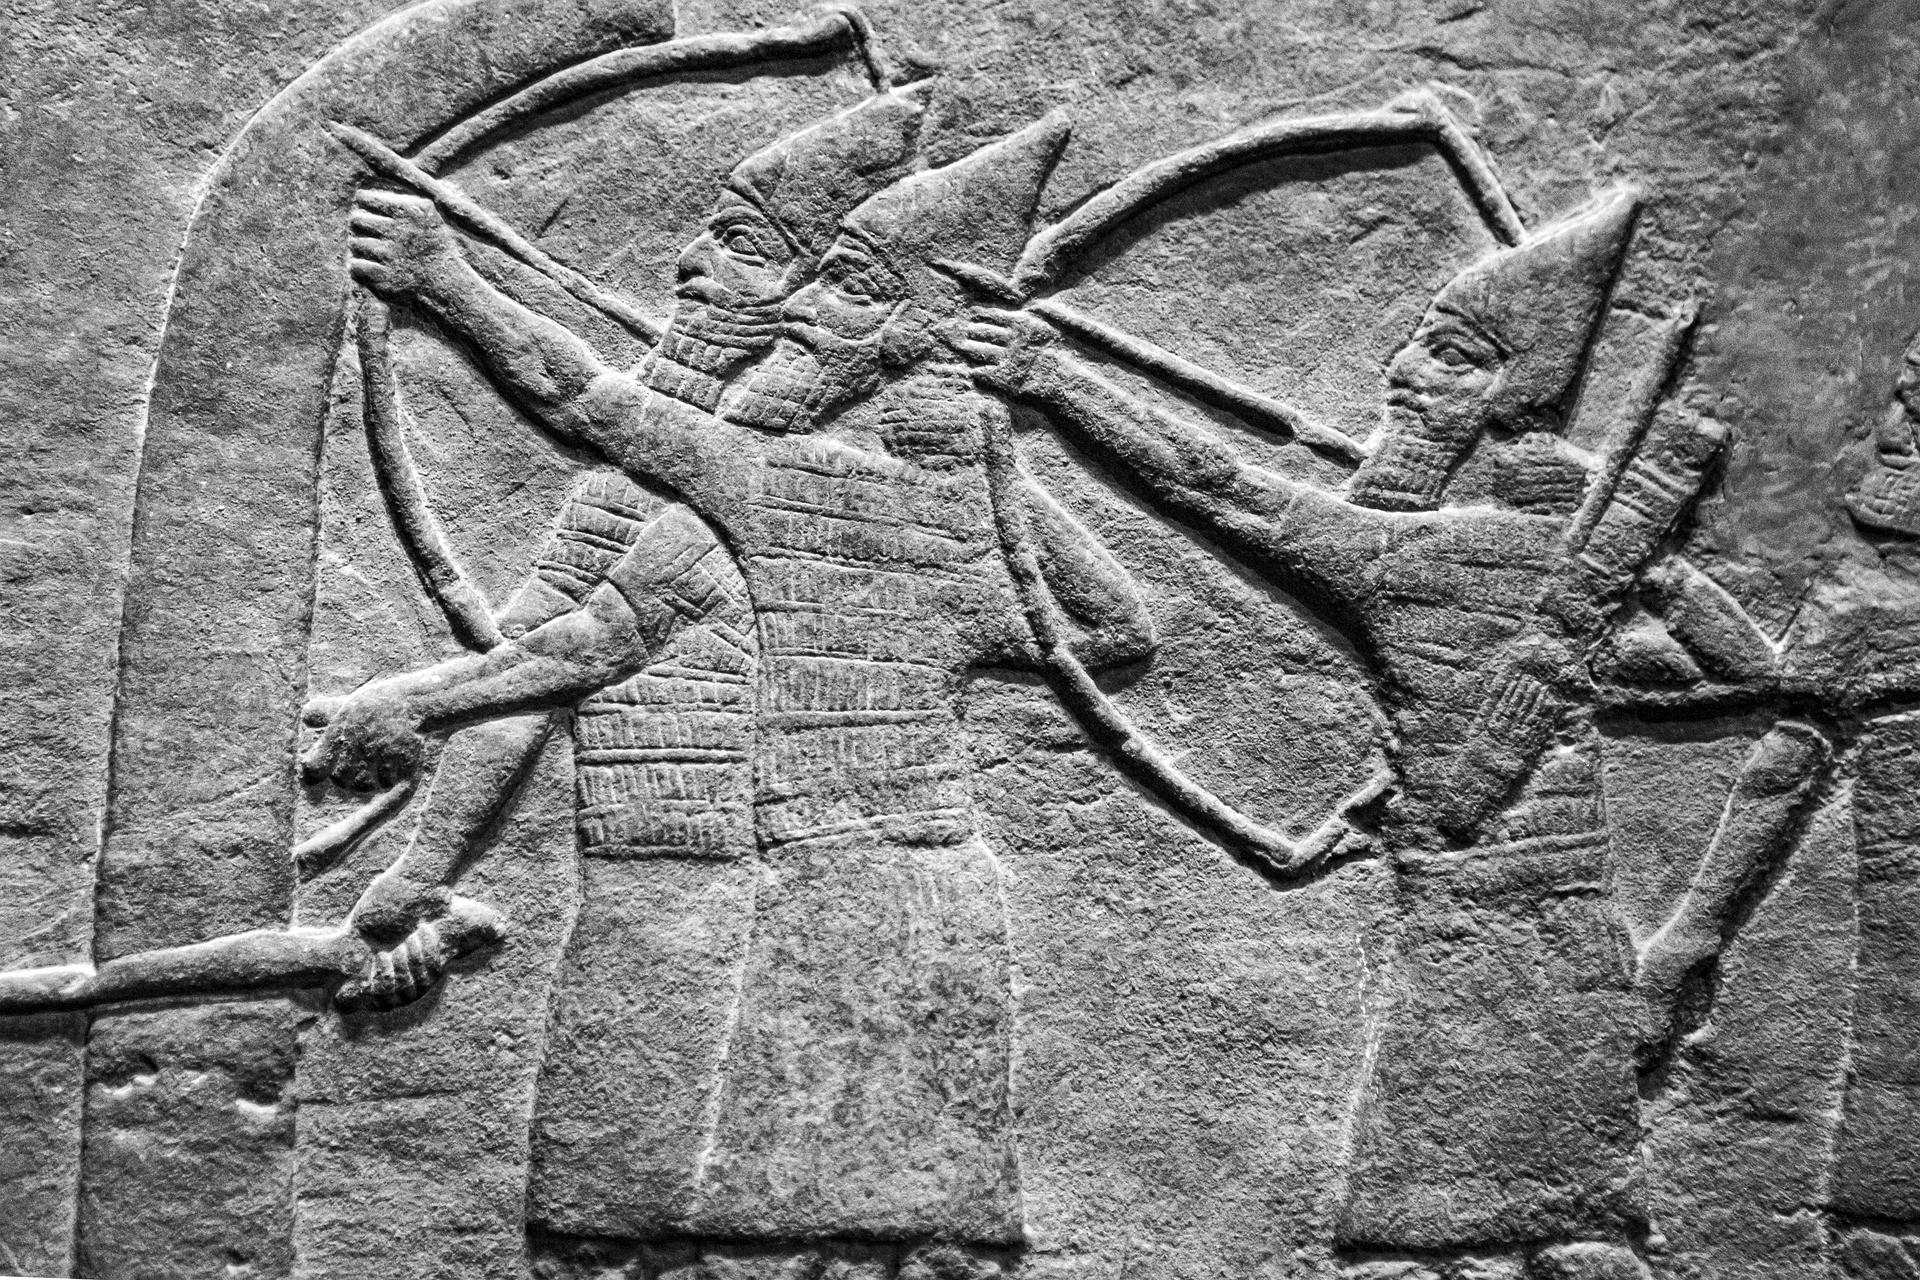 Antico nel British Museum - Foto di Hulki Okan Tabak